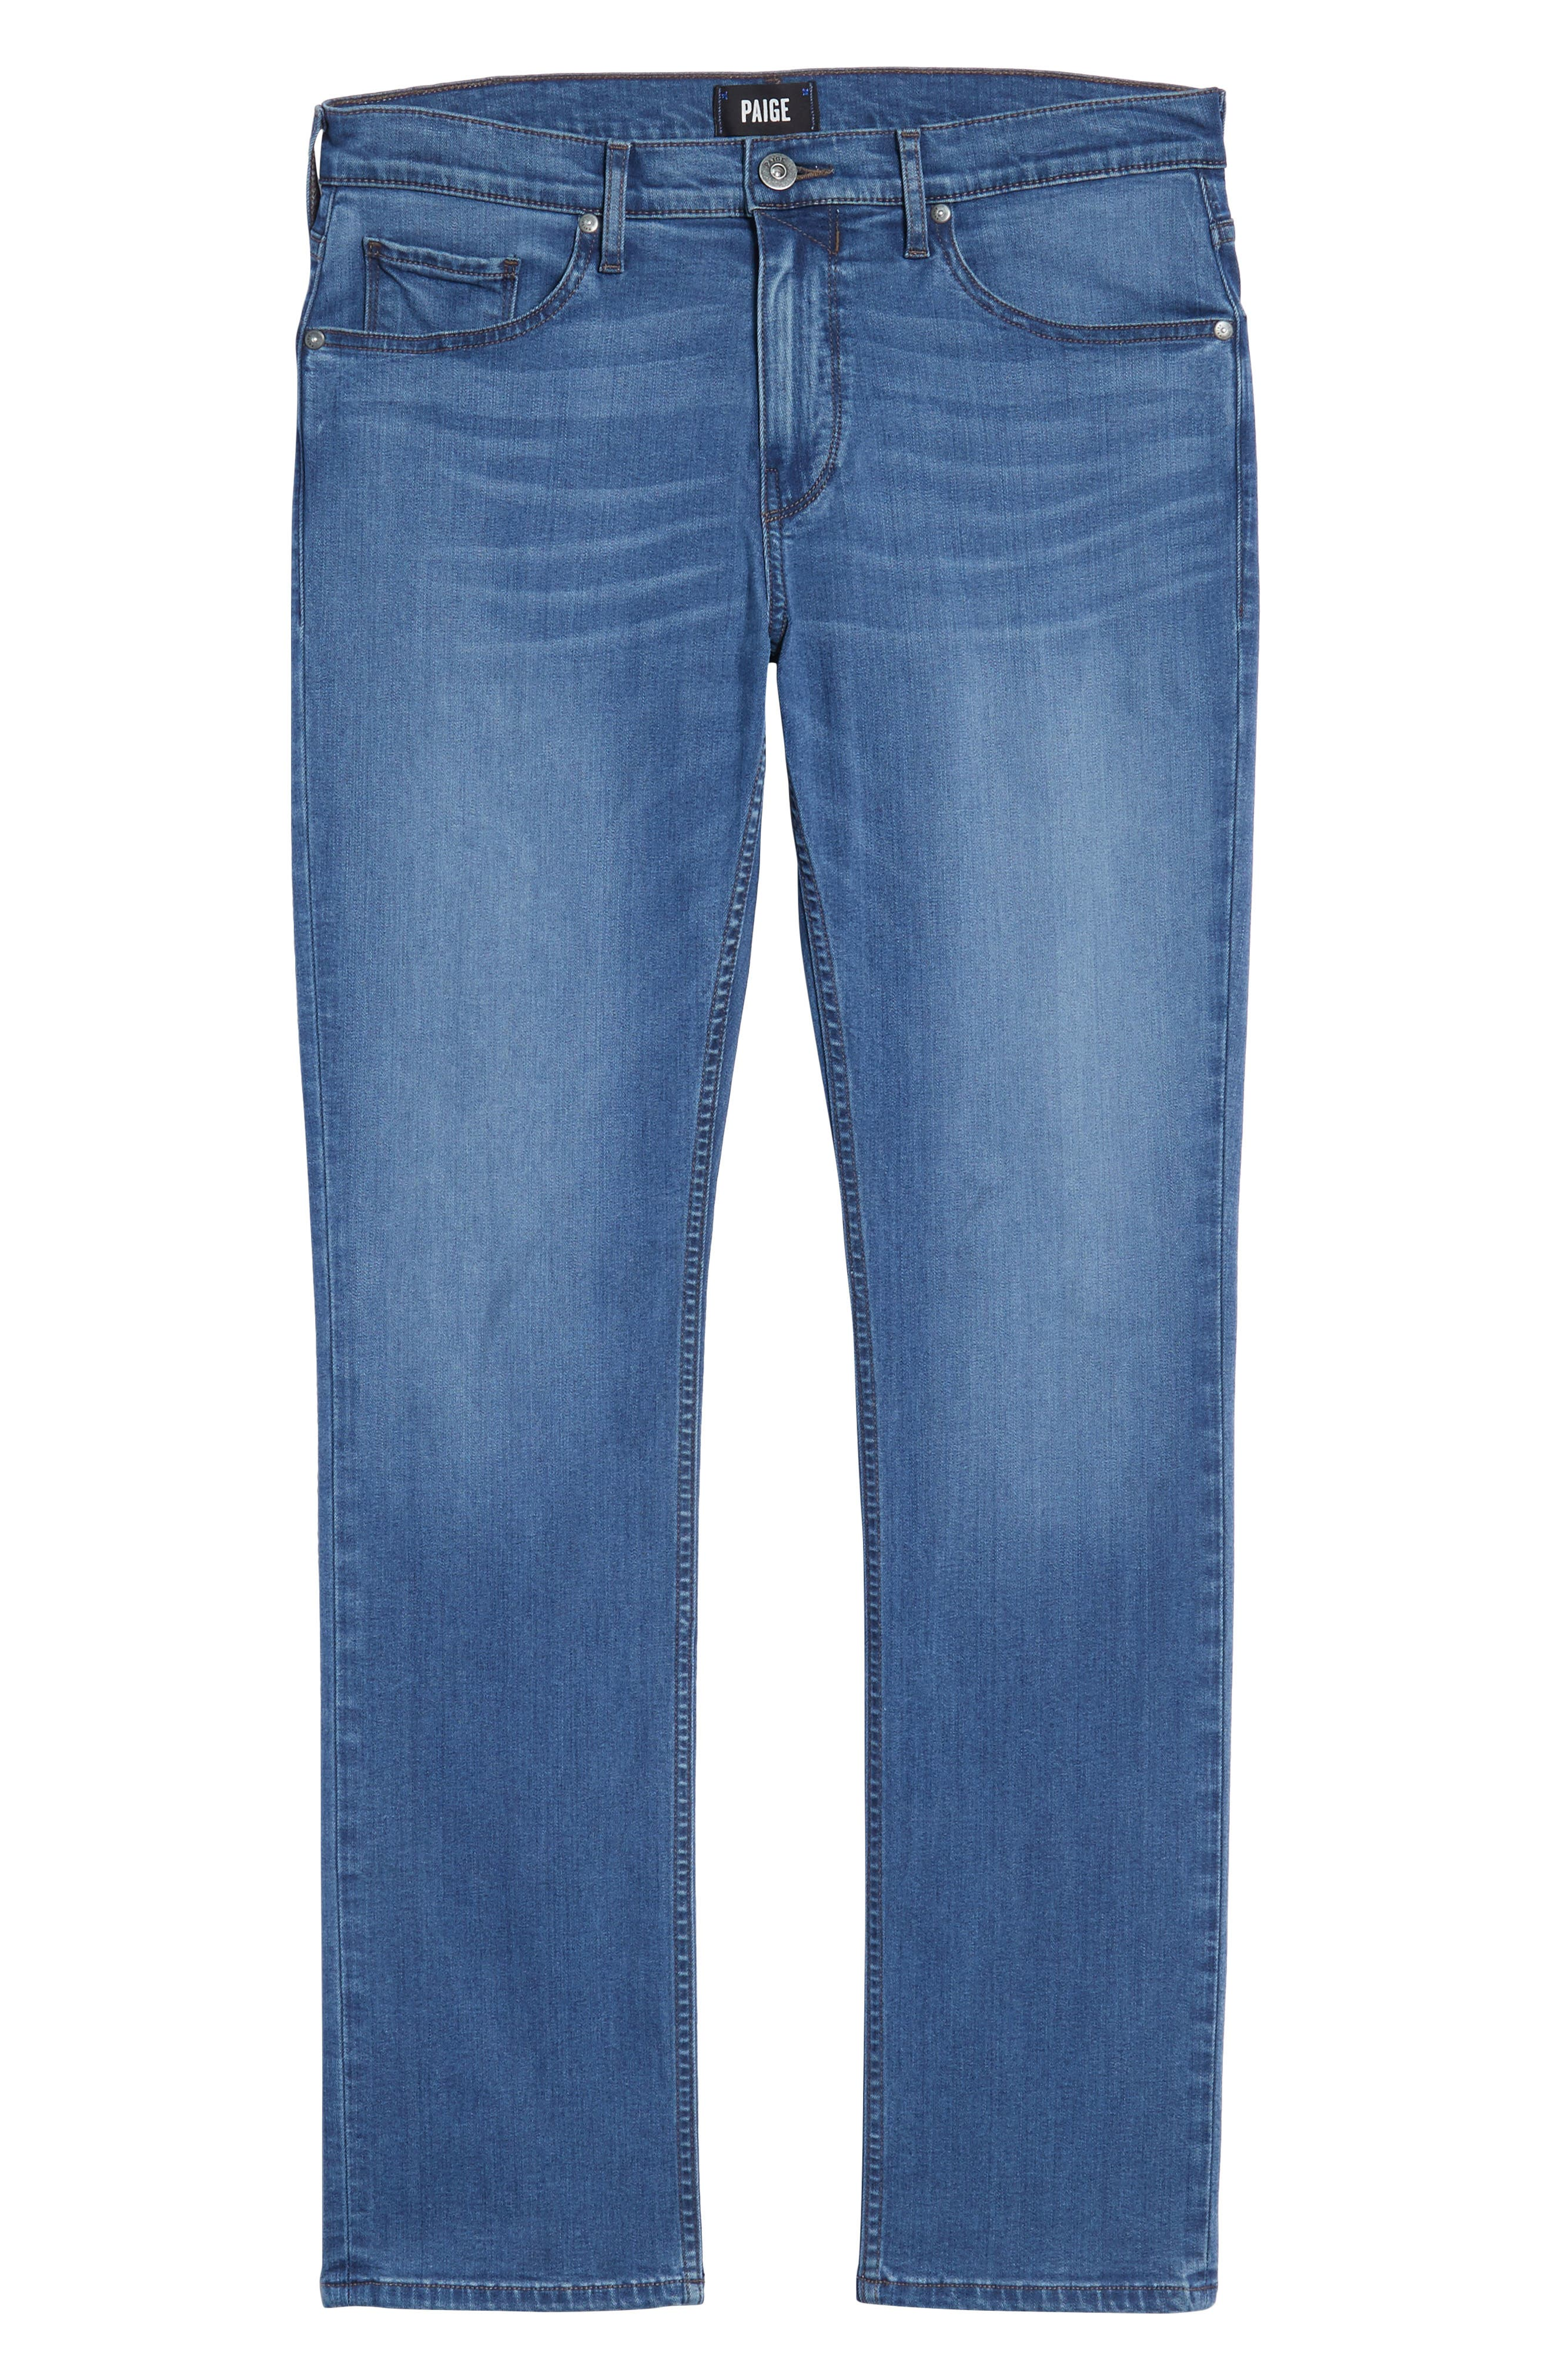 Federal Slim Straight Leg Jeans,                             Alternate thumbnail 6, color,                             400